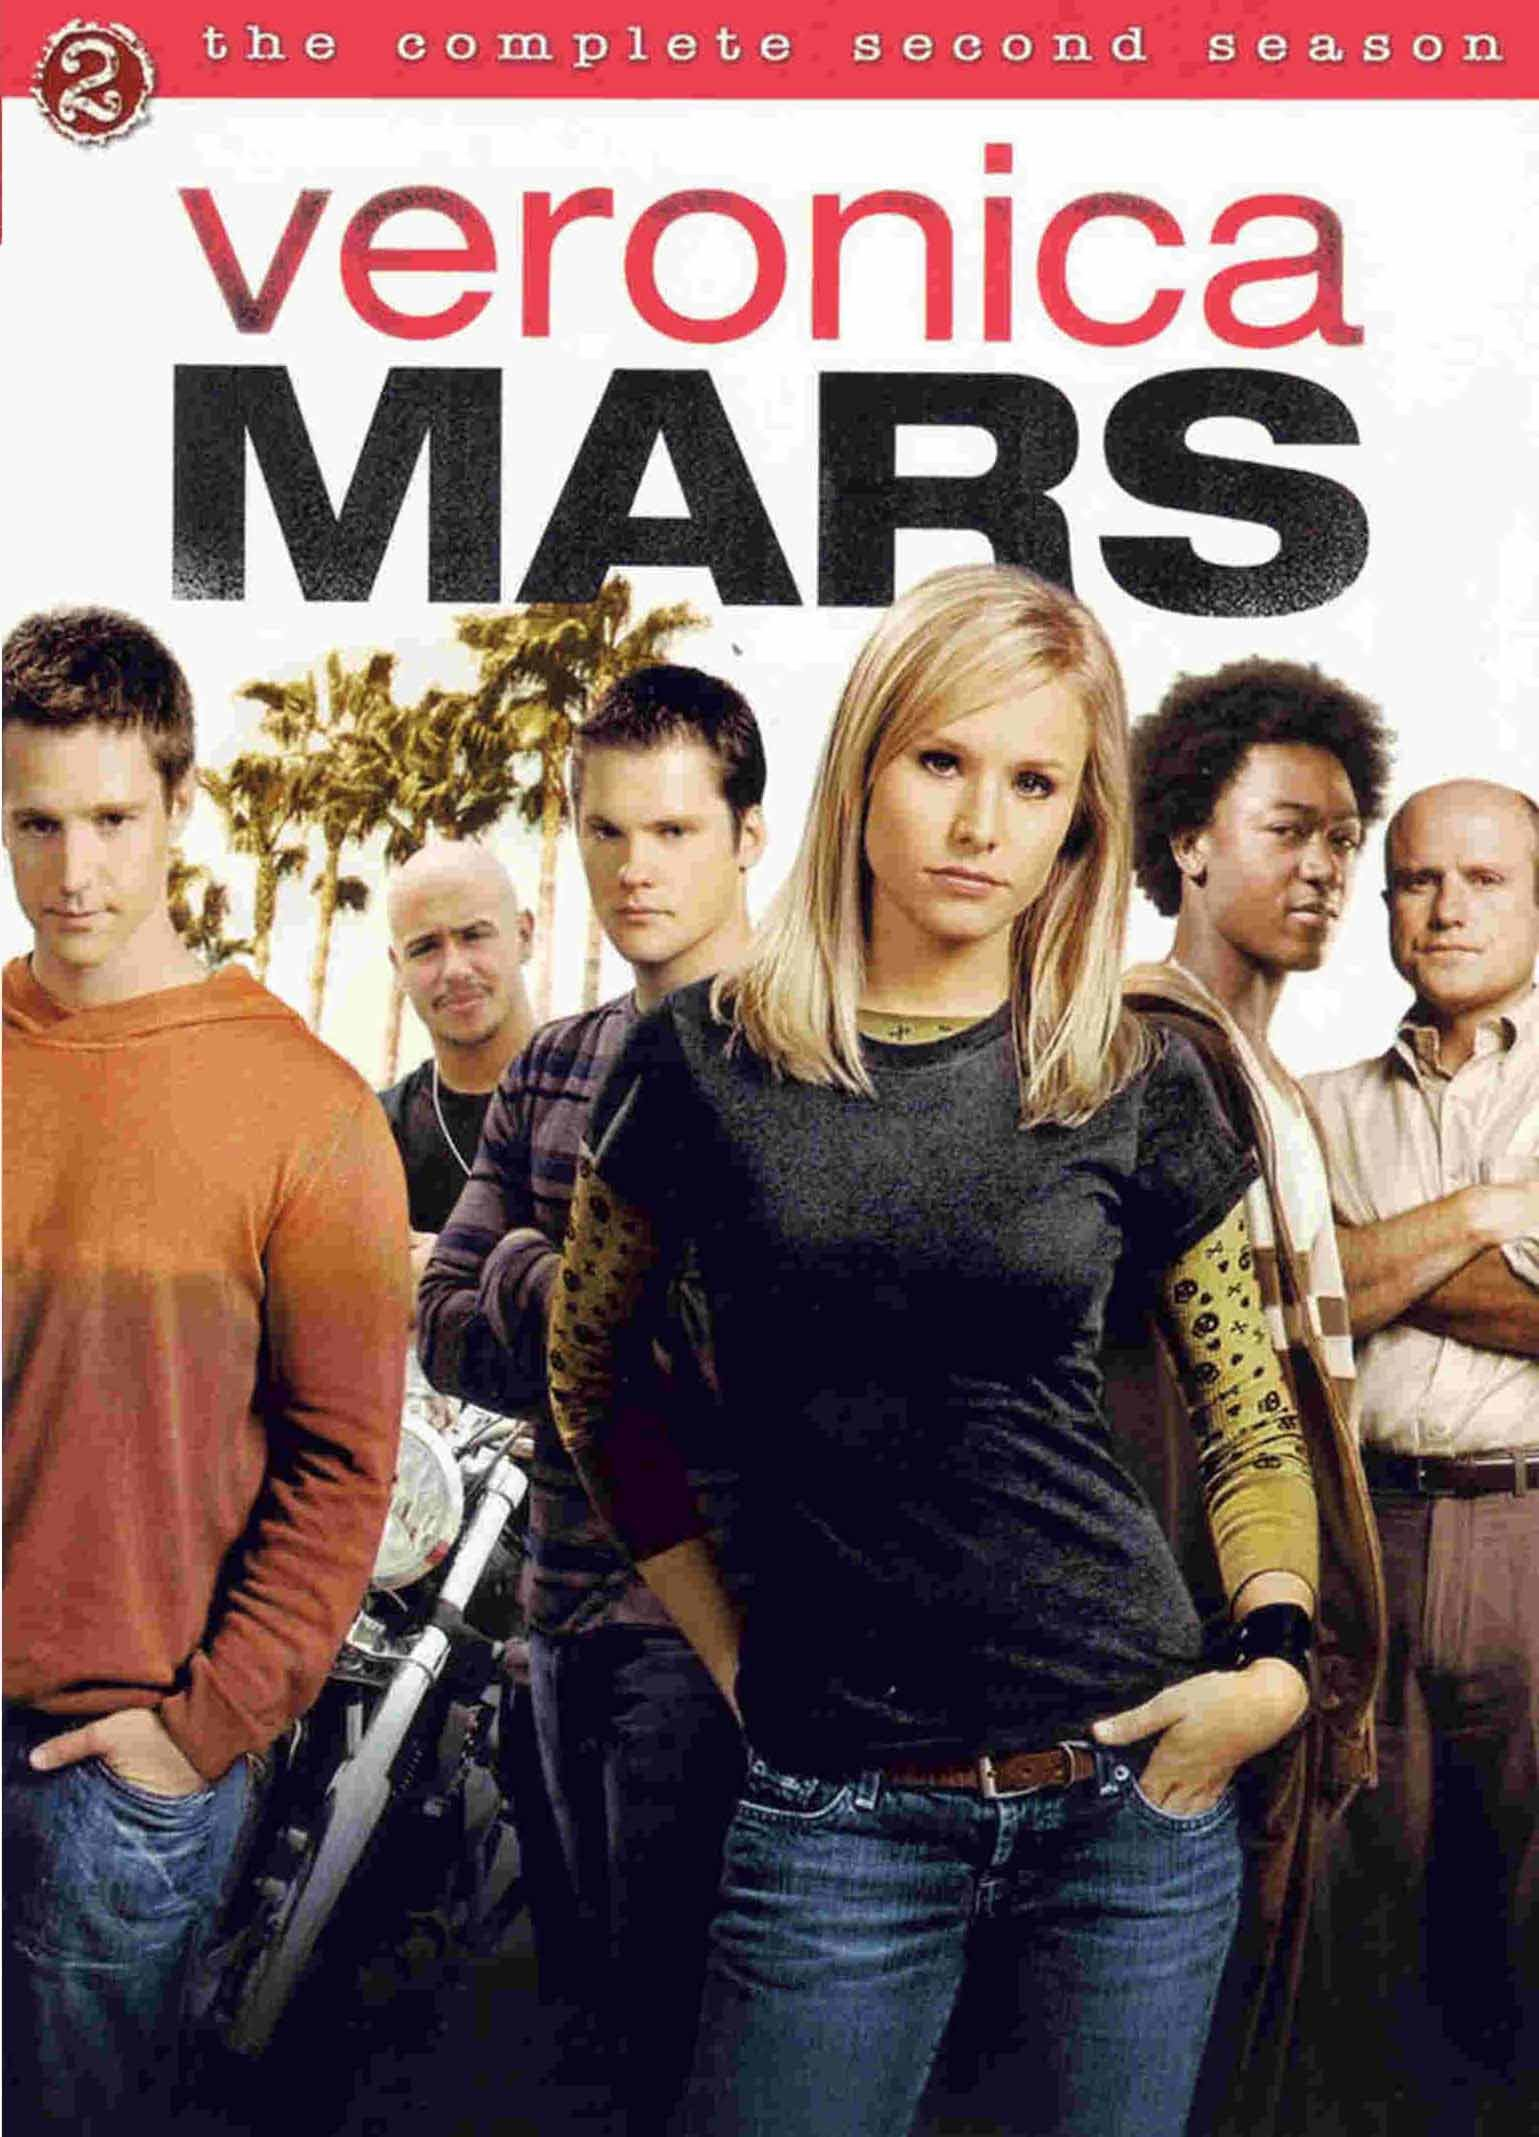 Kristen Bell, Francis Capra, Enrico Colantoni, Jason Dohring, Percy Daggs III, and Teddy Dunn in Veronica Mars (2004)